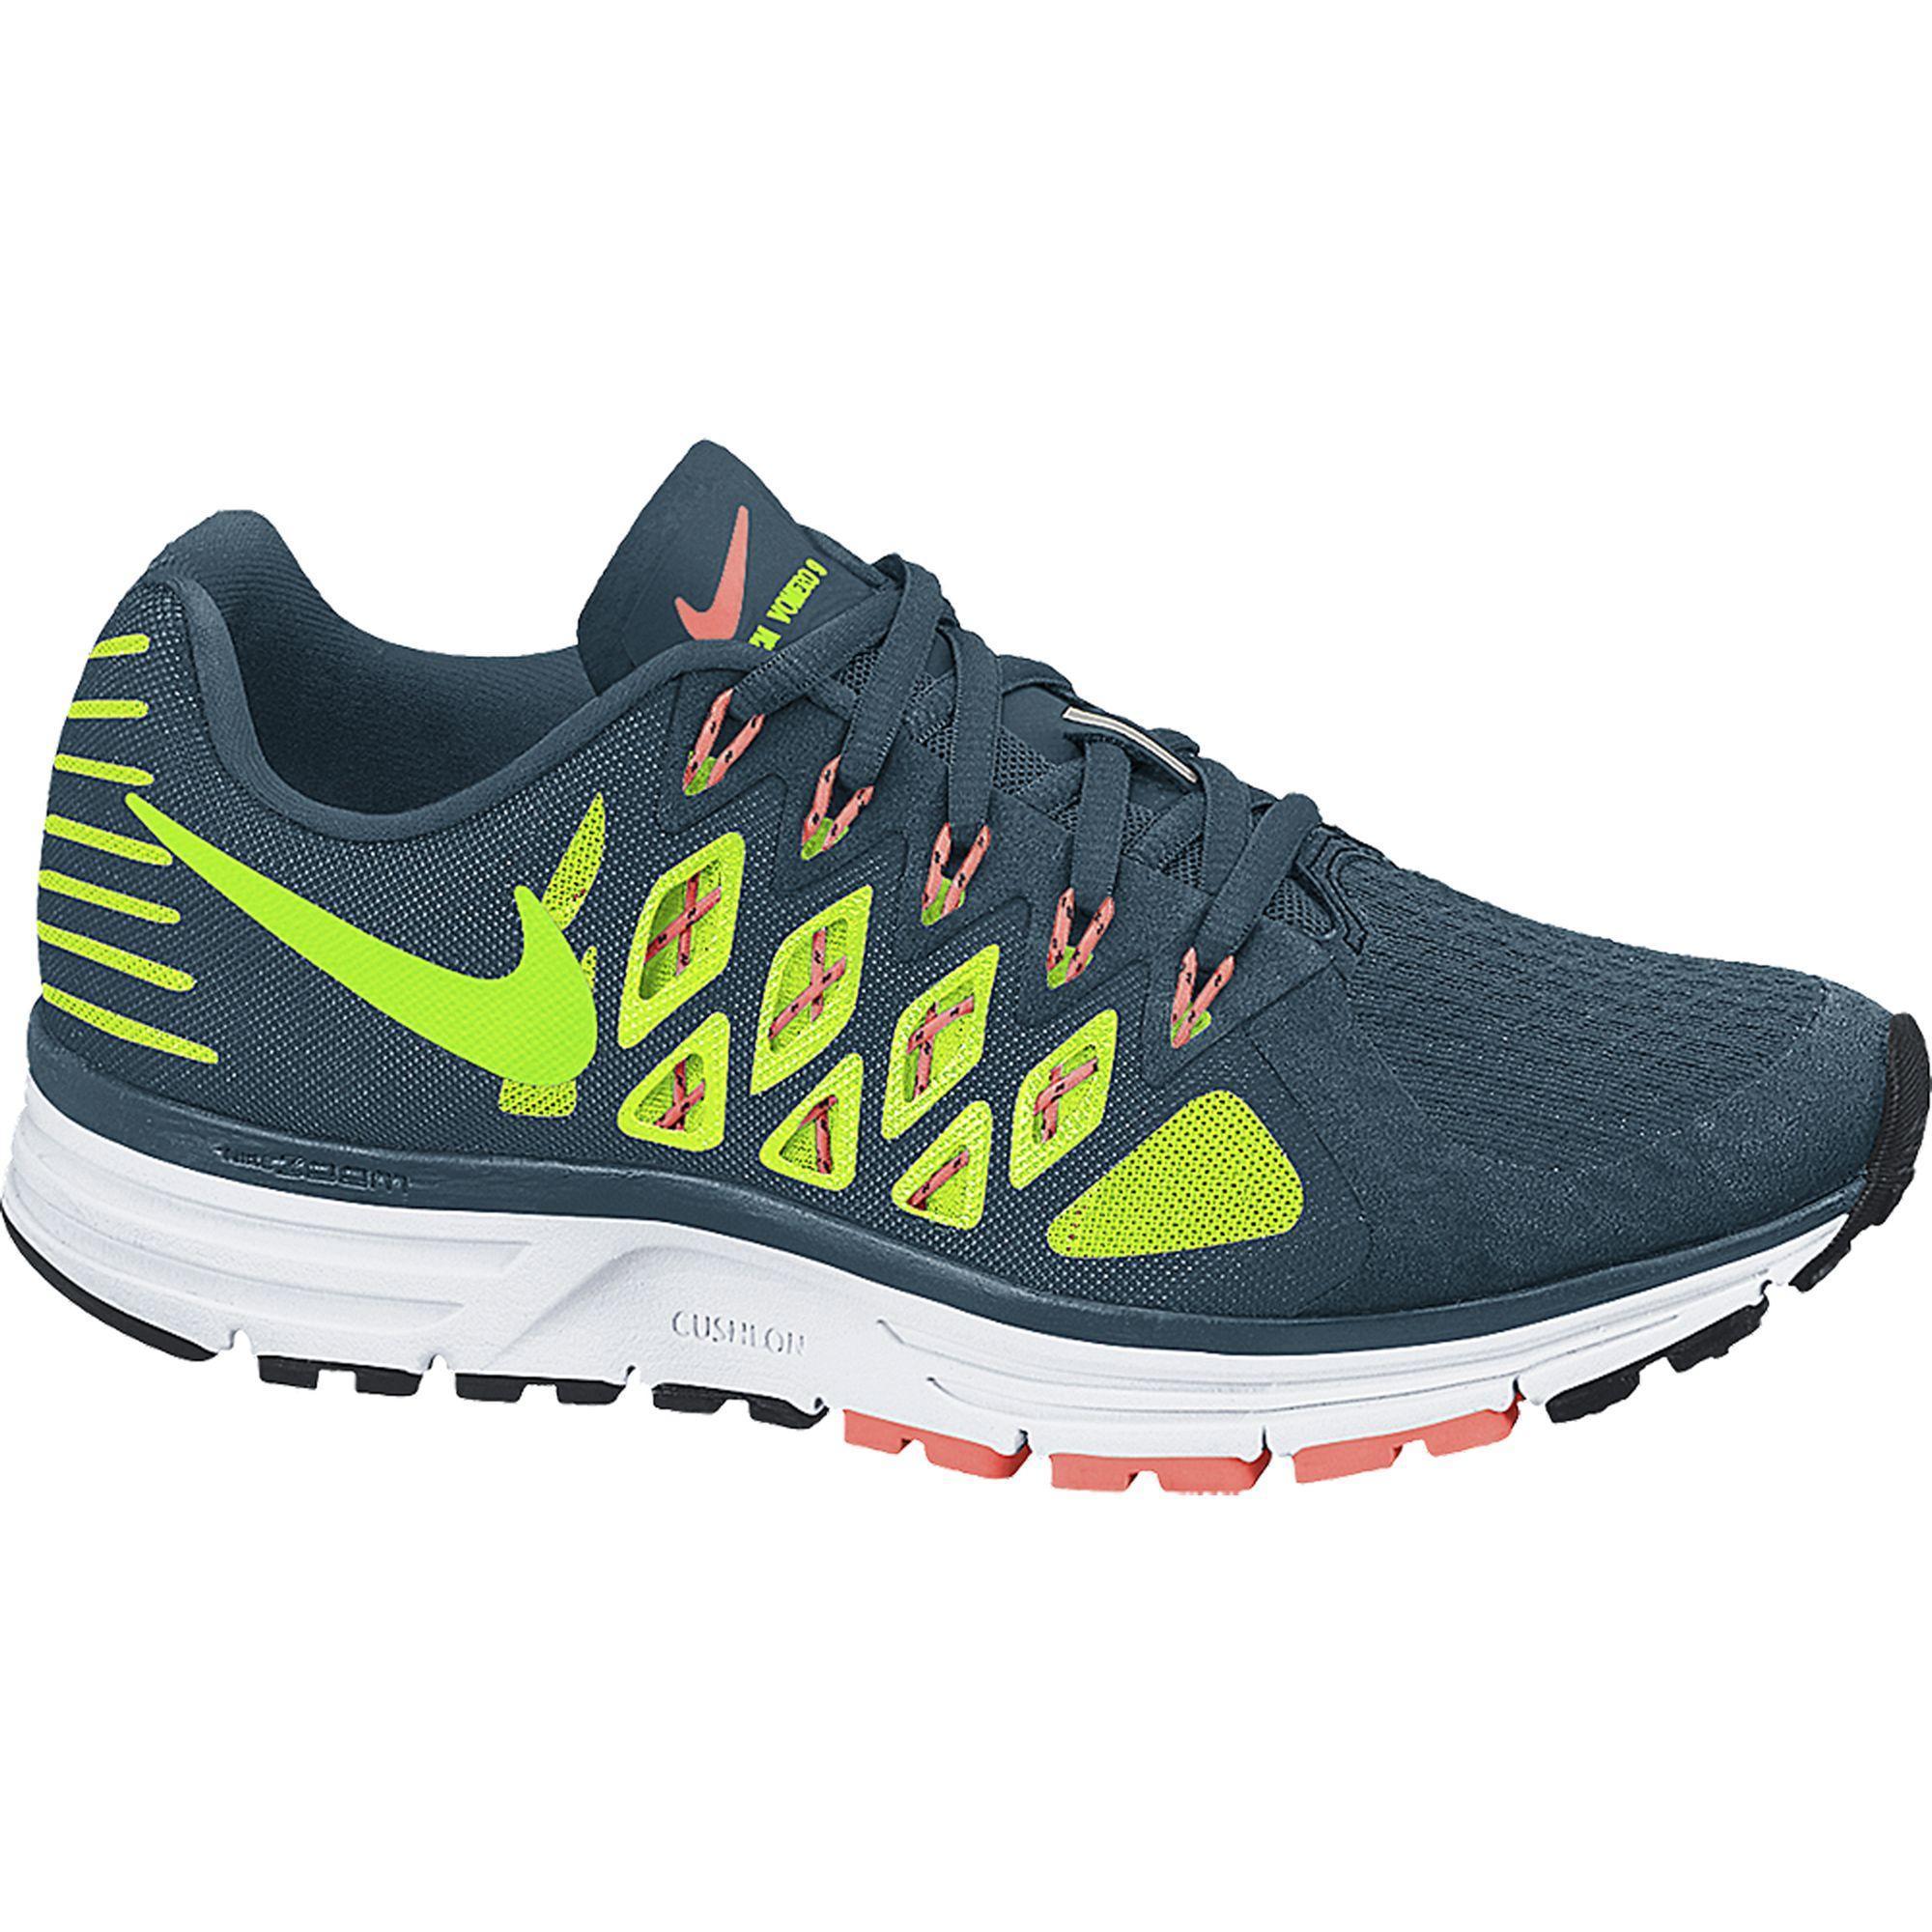 4f59507734d5 Nike Mens Zoom Vomero 9 Running Shoes - Space Blue Electric Green -  Tennisnuts.com